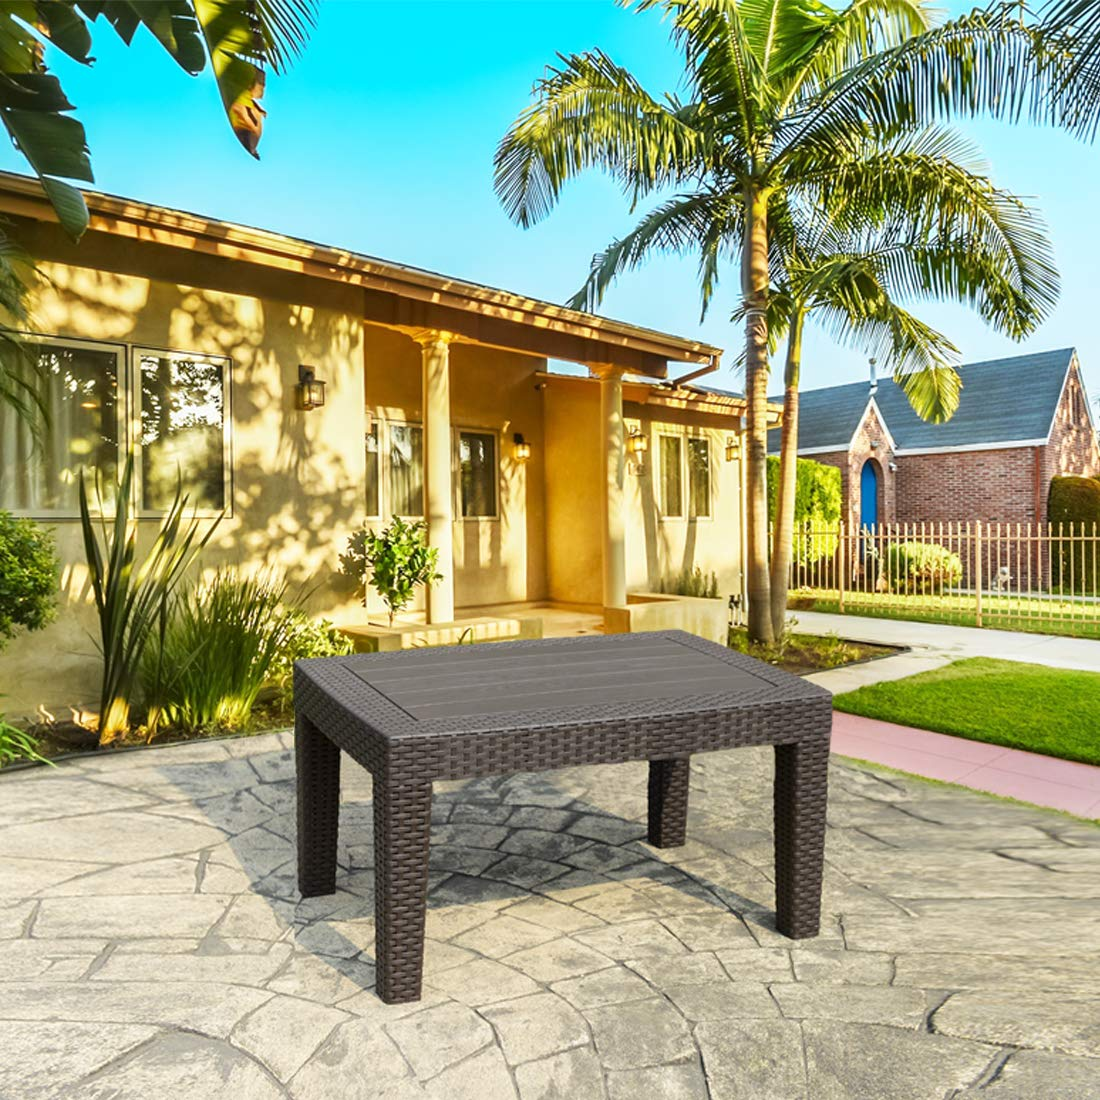 Thplus Resin Plastic Rattan Wicker Pattern Out Door Coffee Table All Weather Outdoor Patio Garden Backyard Furniture